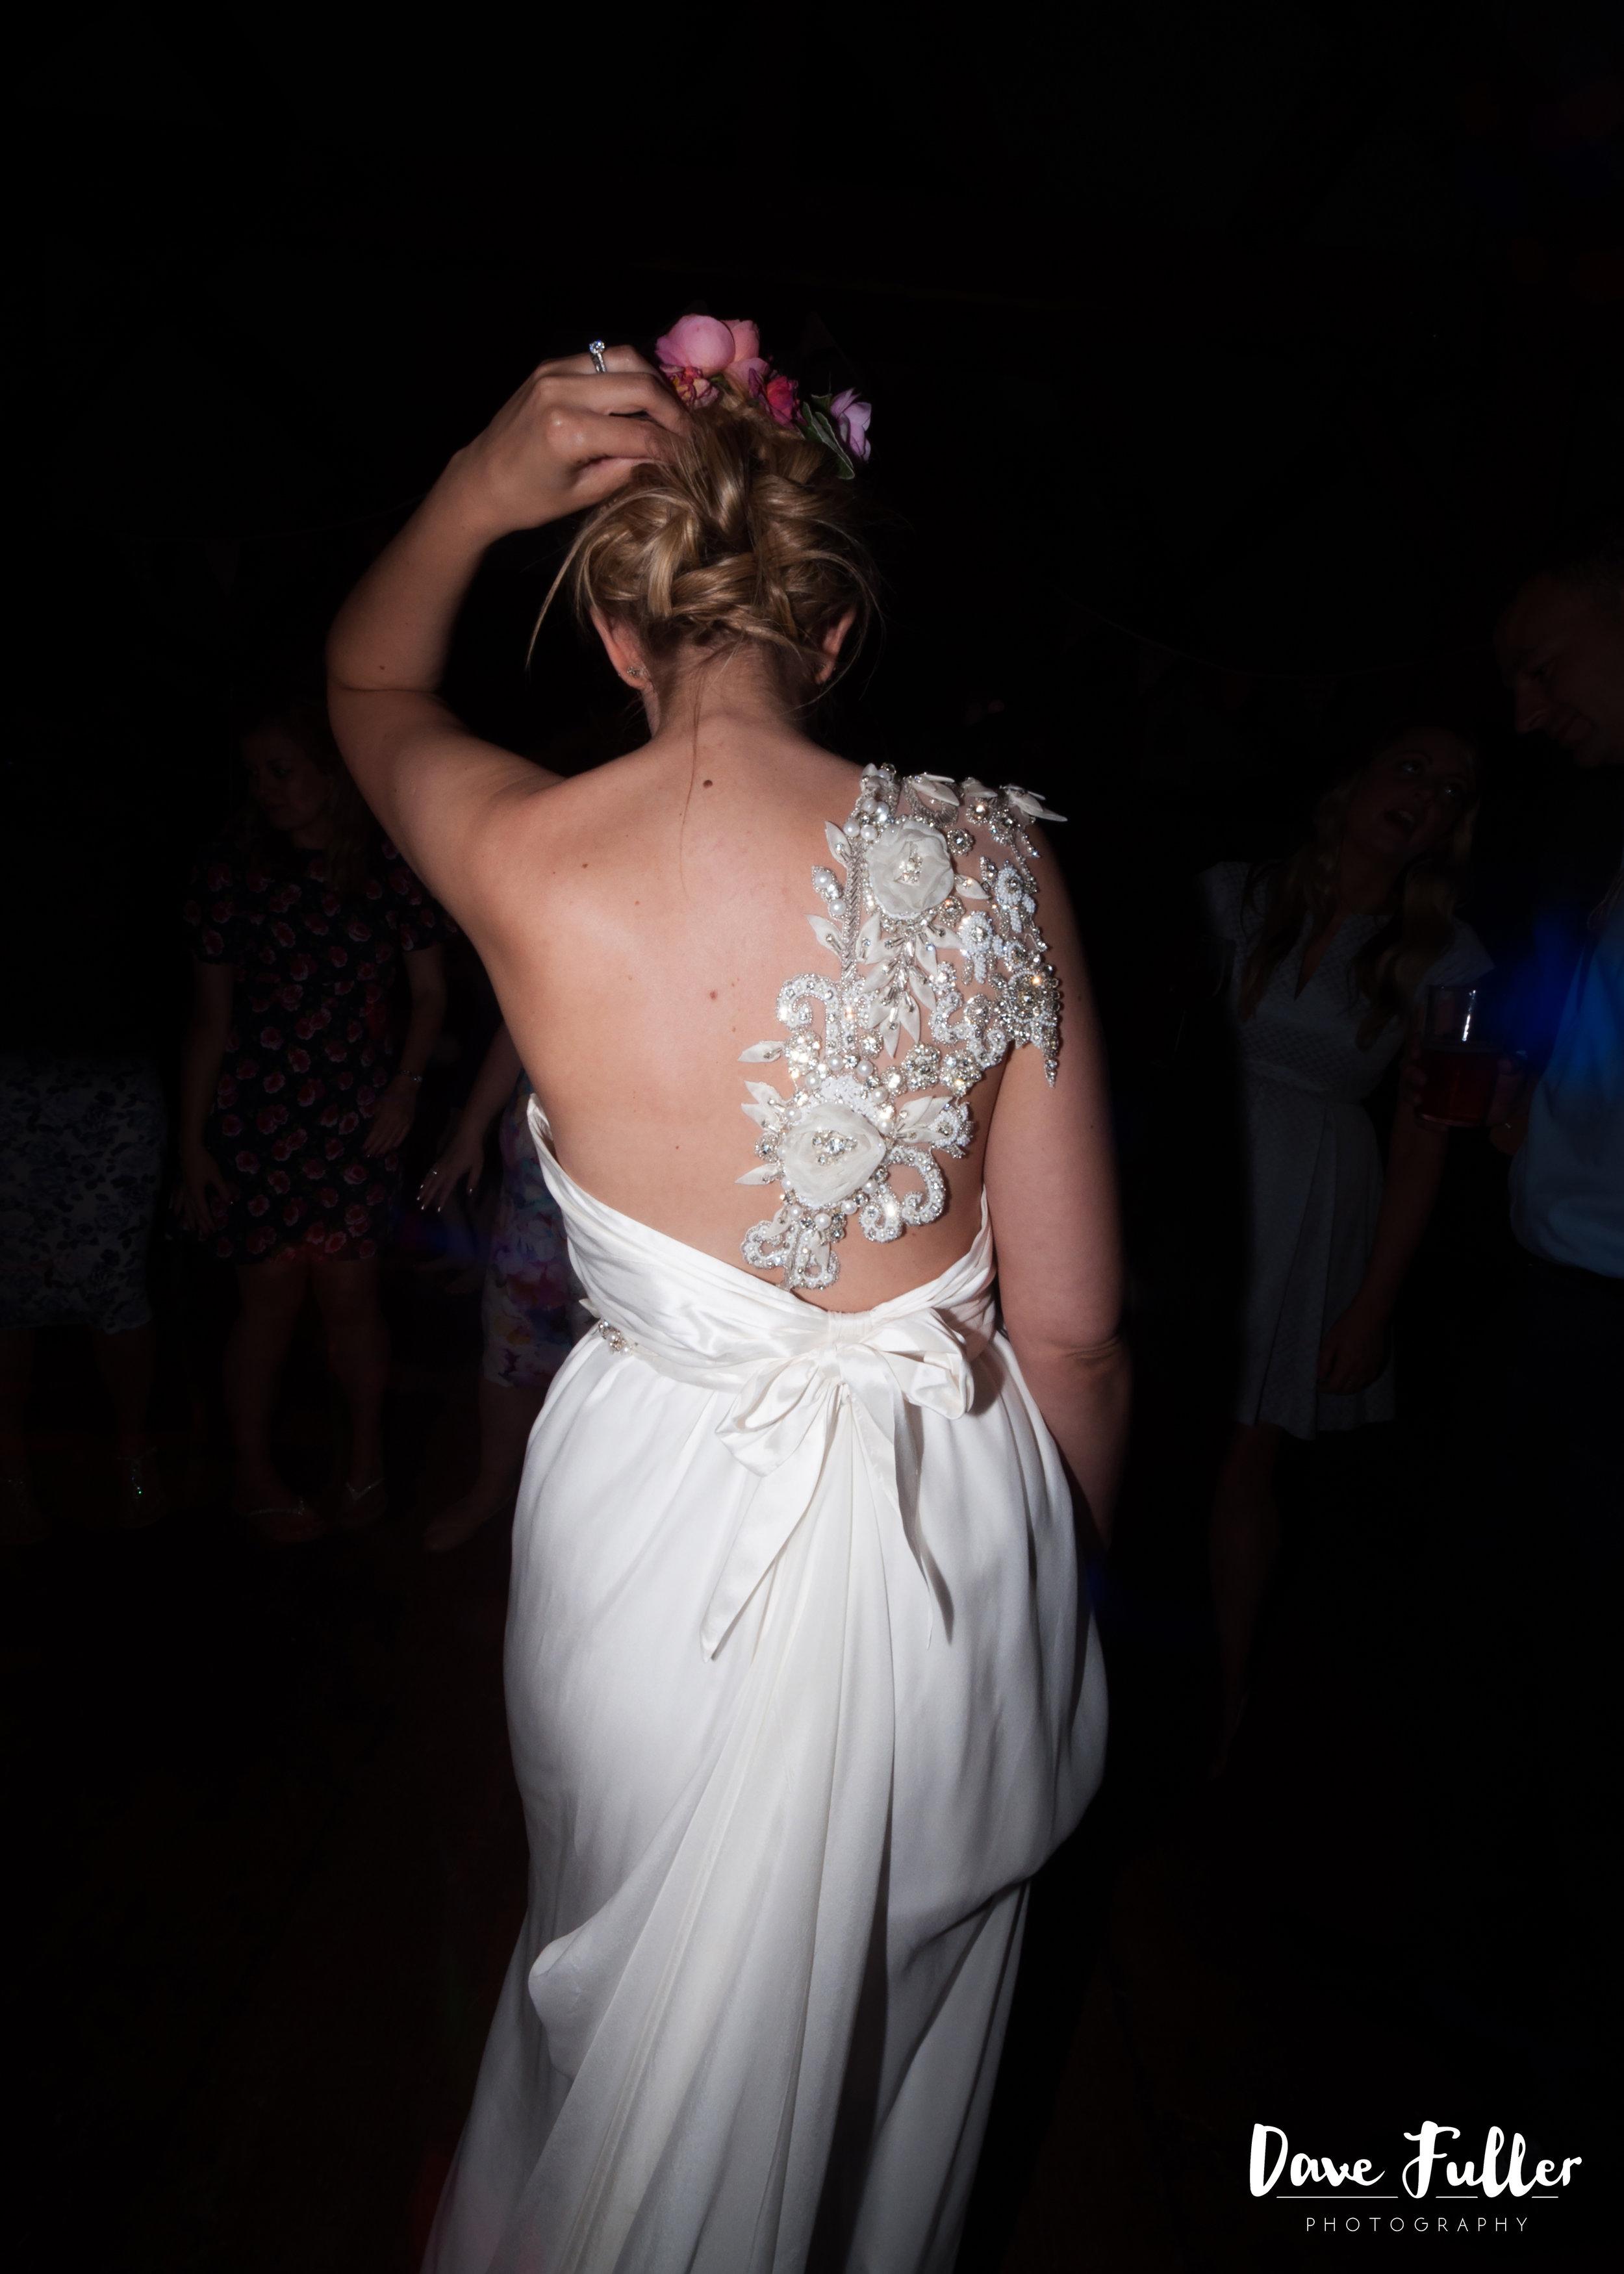 Nottingham Wedding PhotographerMckellar-Savage11.jpg